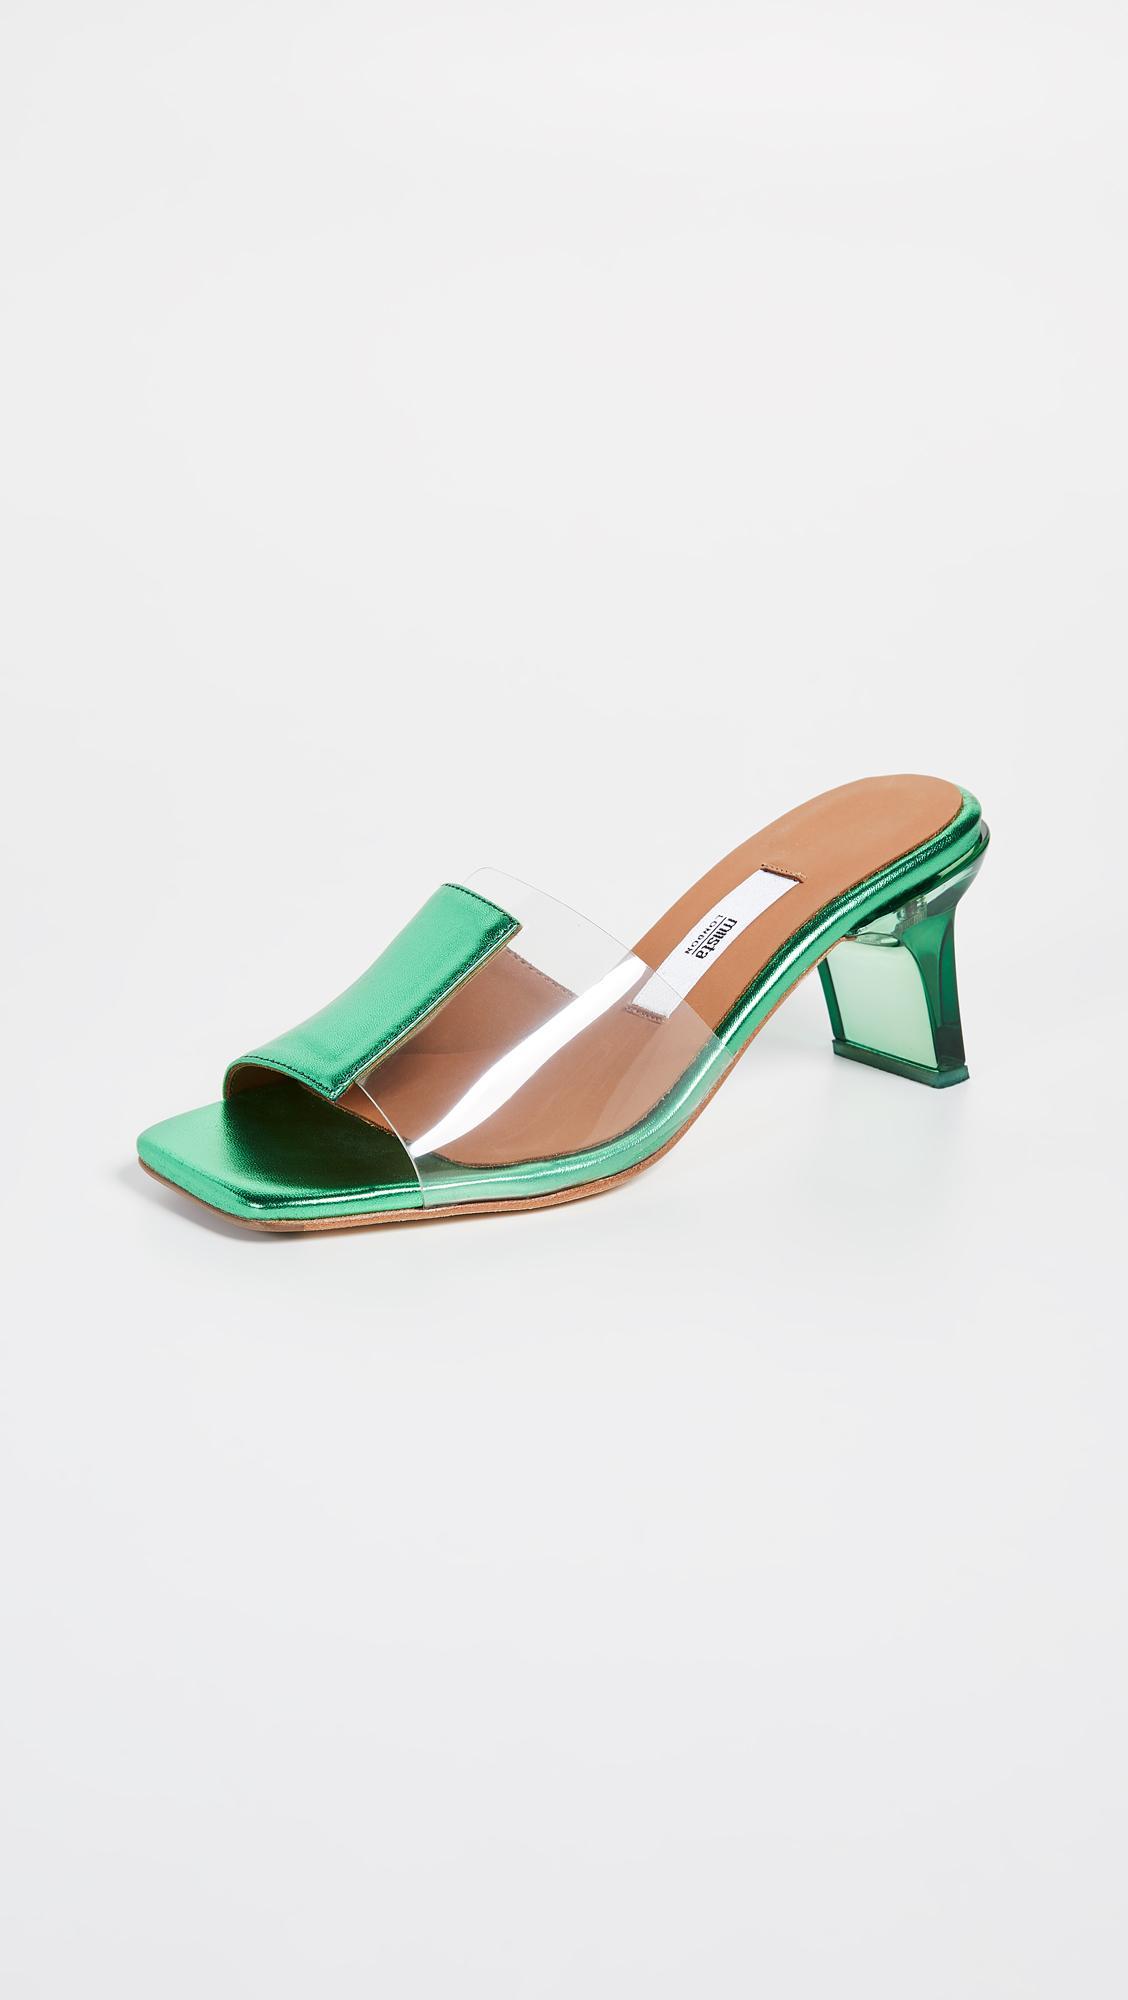 1e8084df6c1 Lyst - Miista Indira Slides in Green